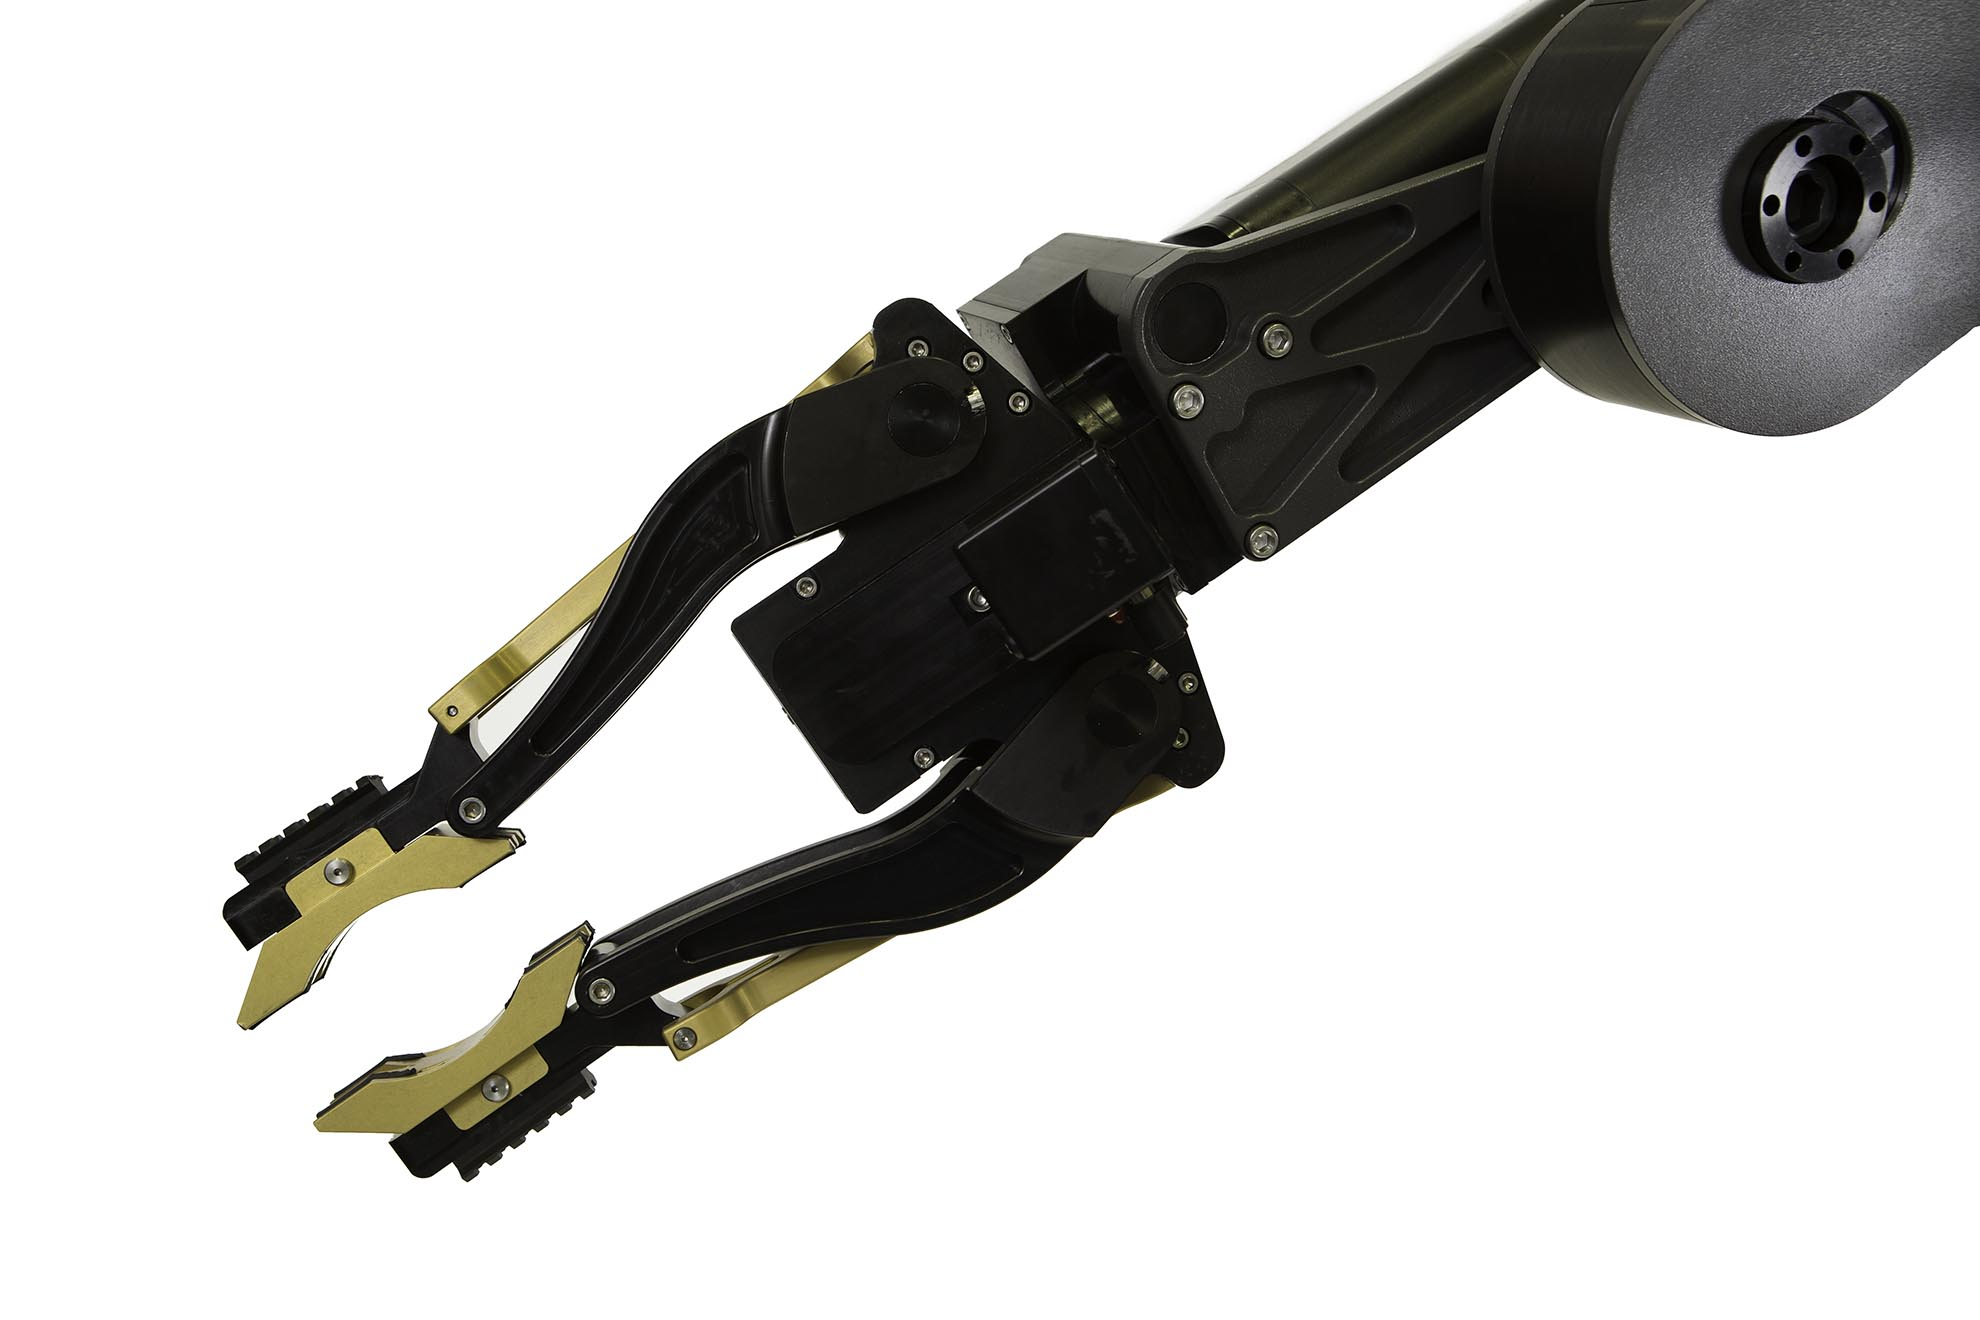 caliber-mk4-lvbied-robot-claw